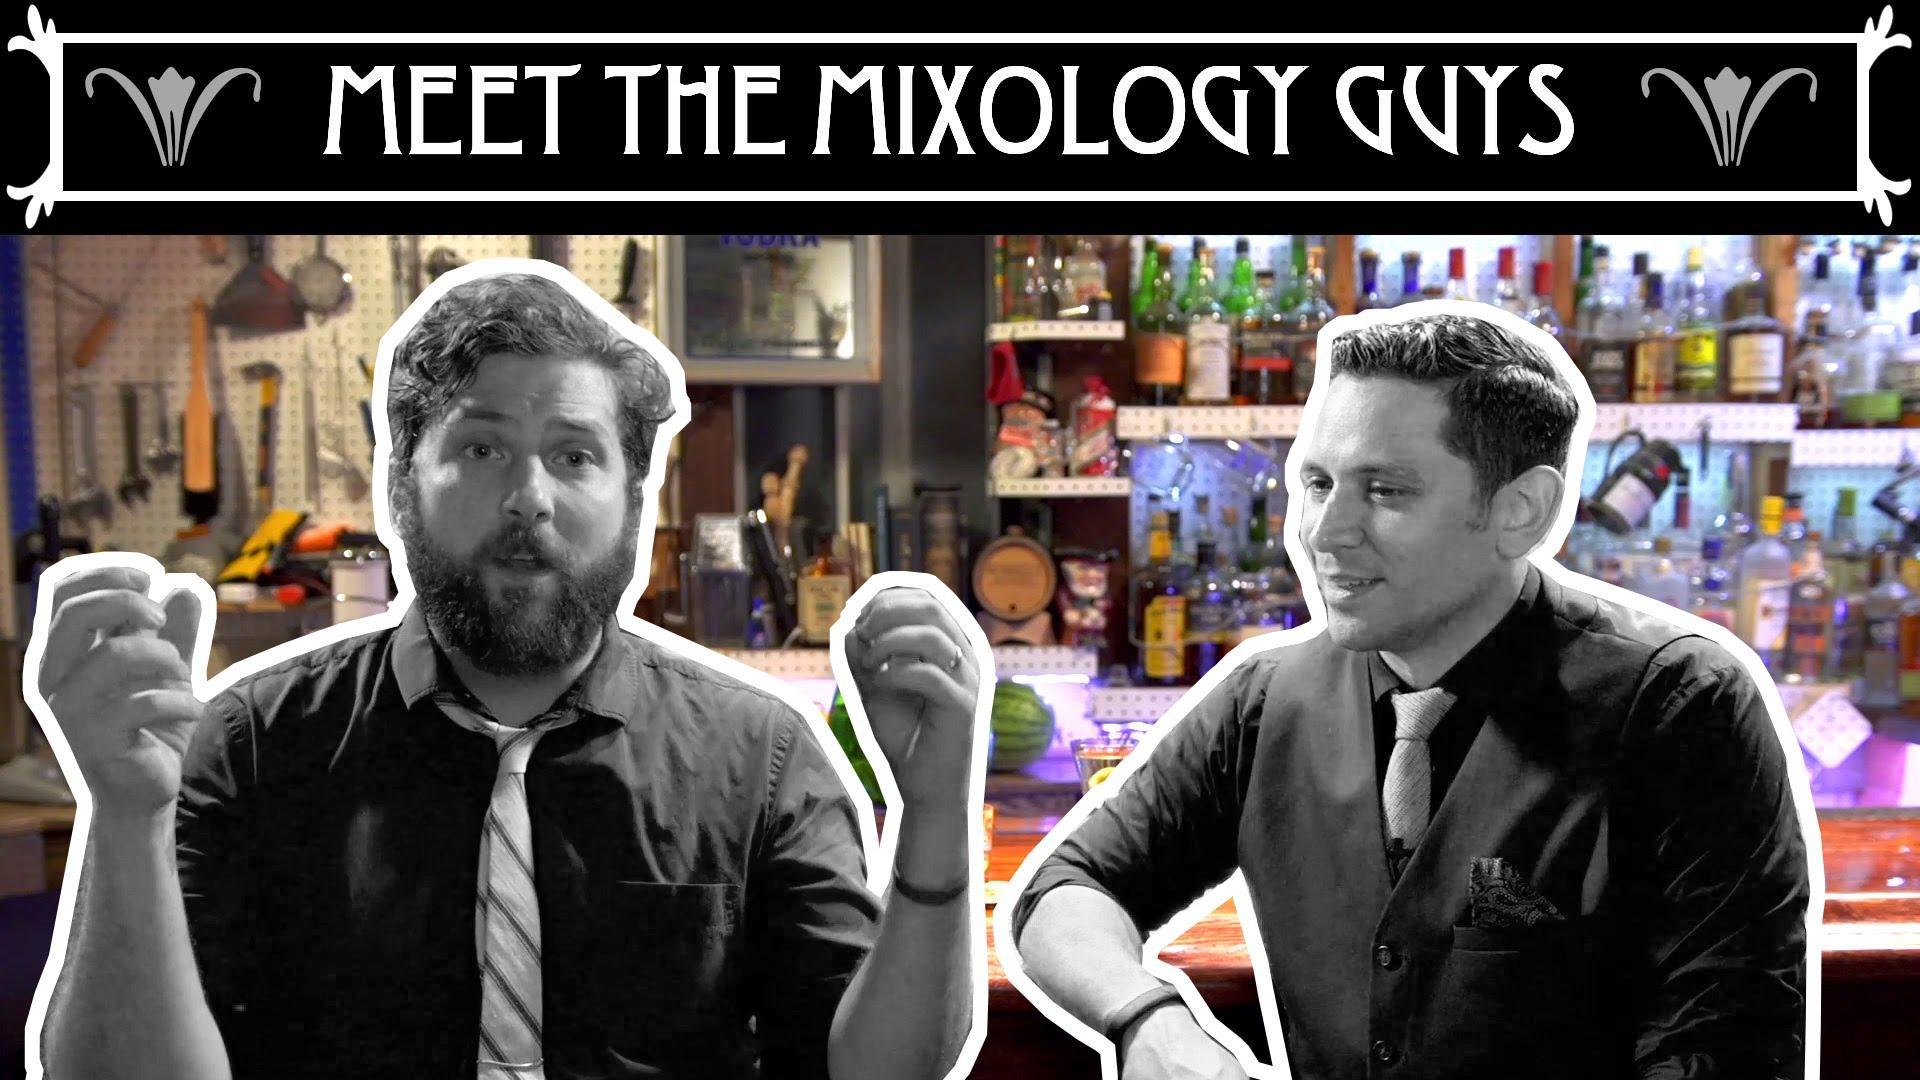 Meet the Mixology Guys: Joe Brooke and Jason Bran